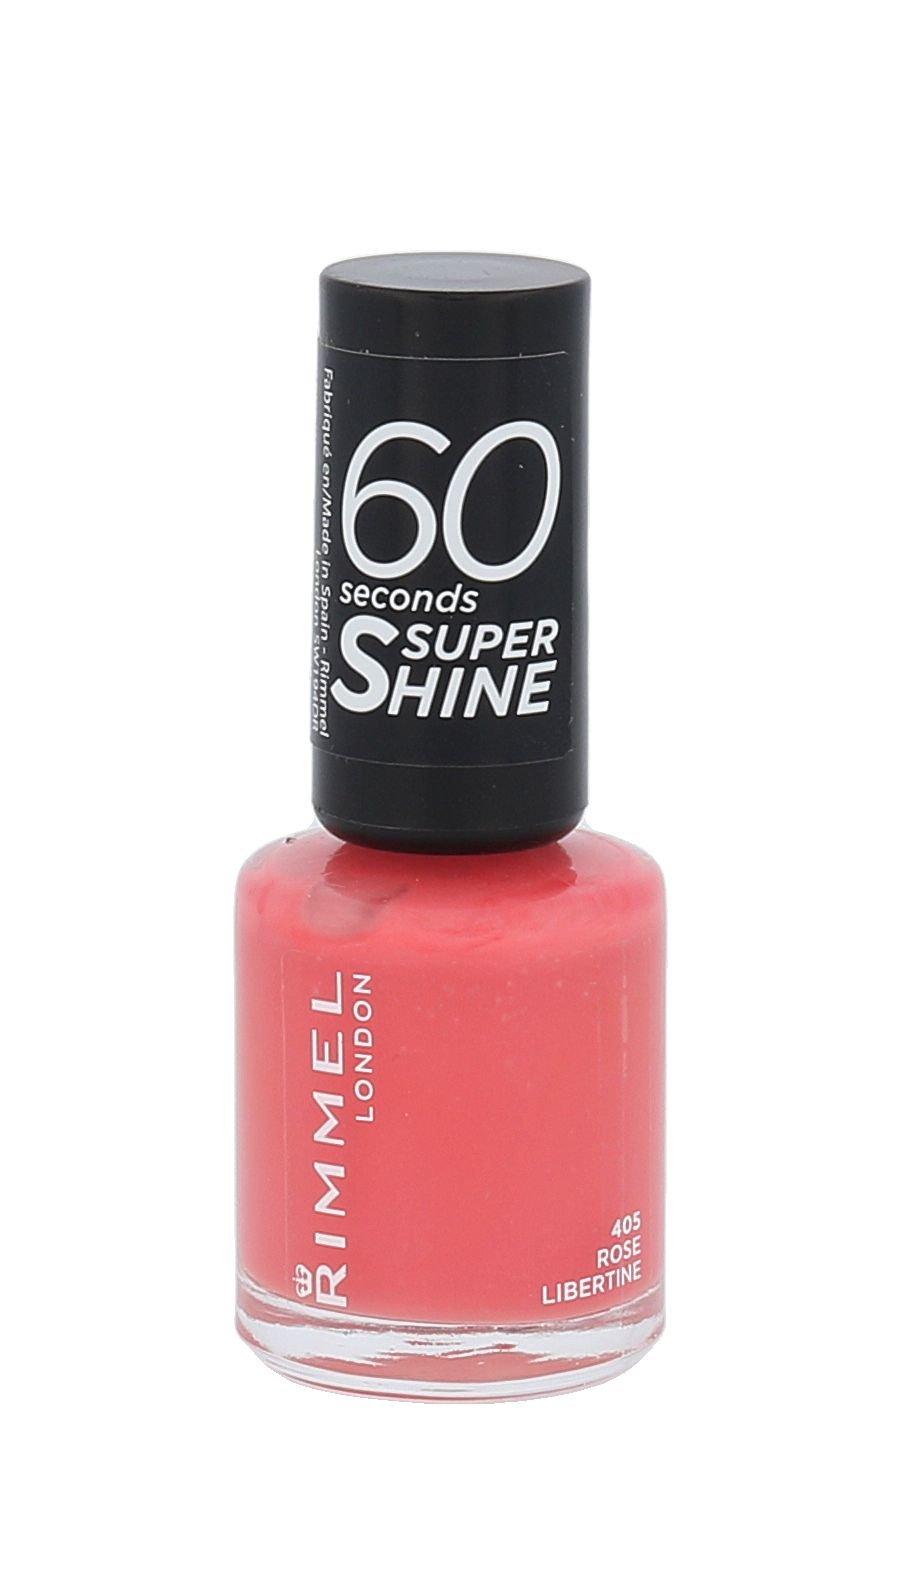 Rimmel London 60 Seconds Cosmetic 8ml 405 Rose Libertine